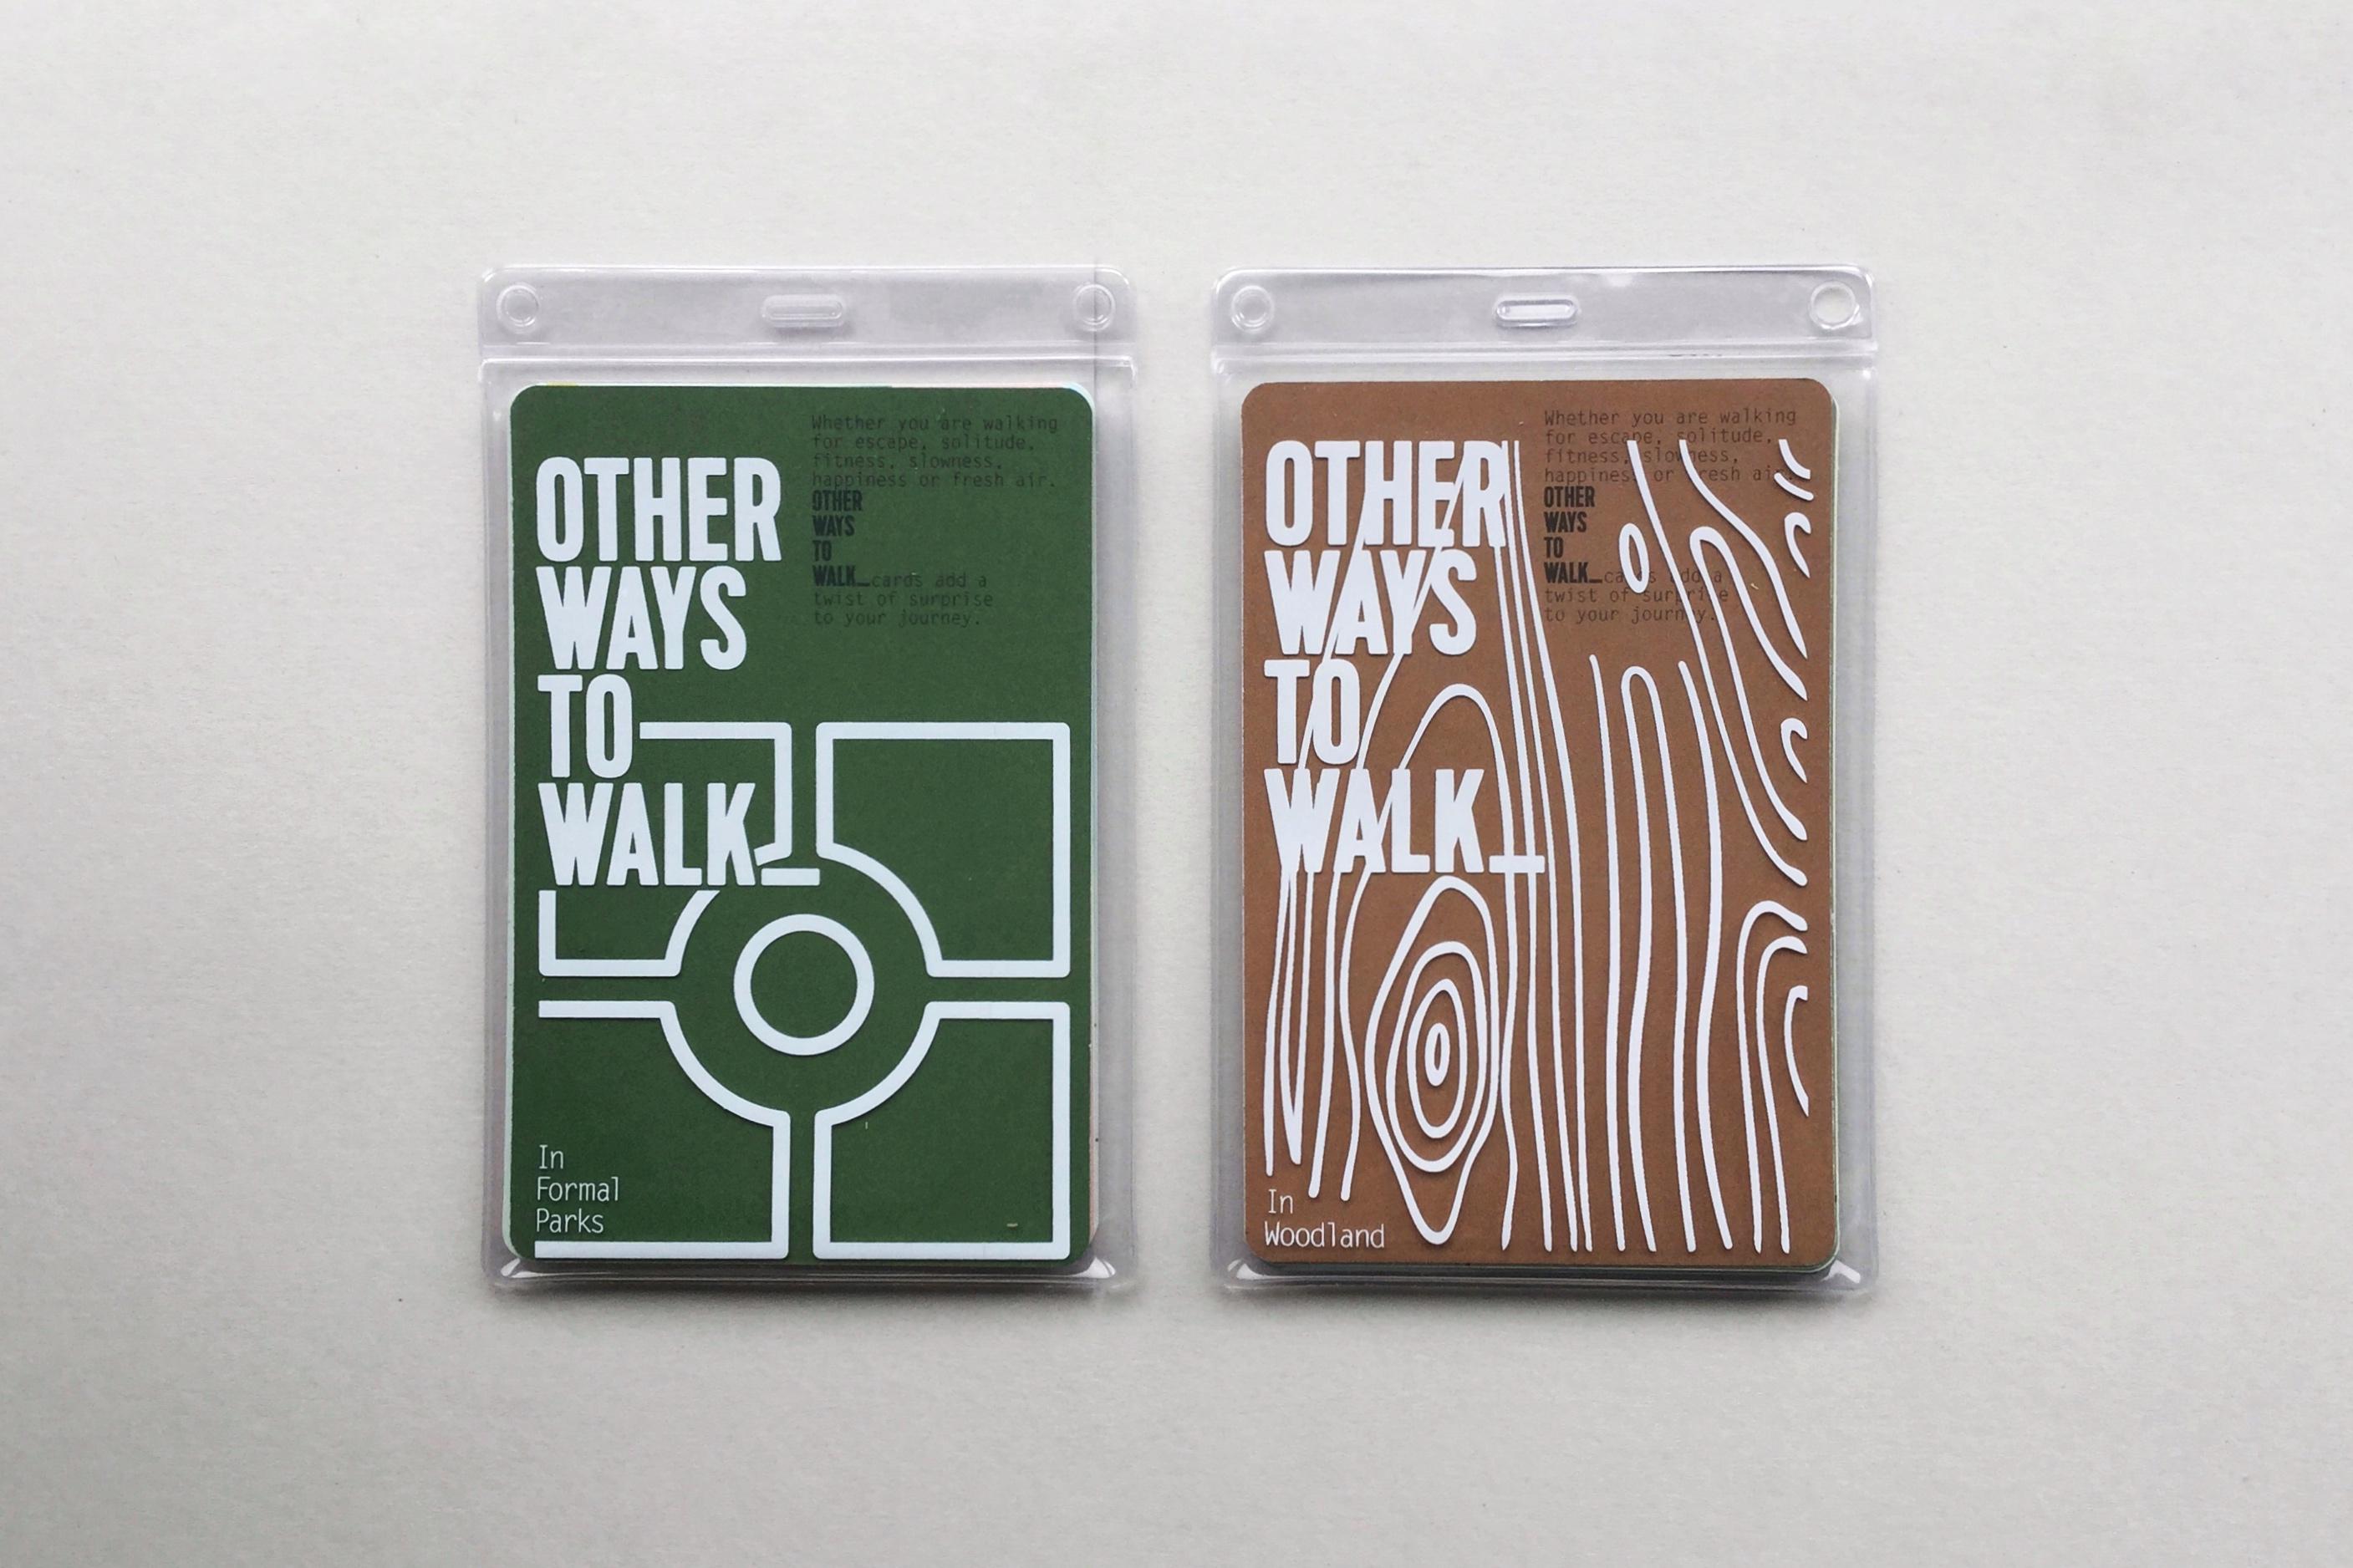 Other Ways to Walk